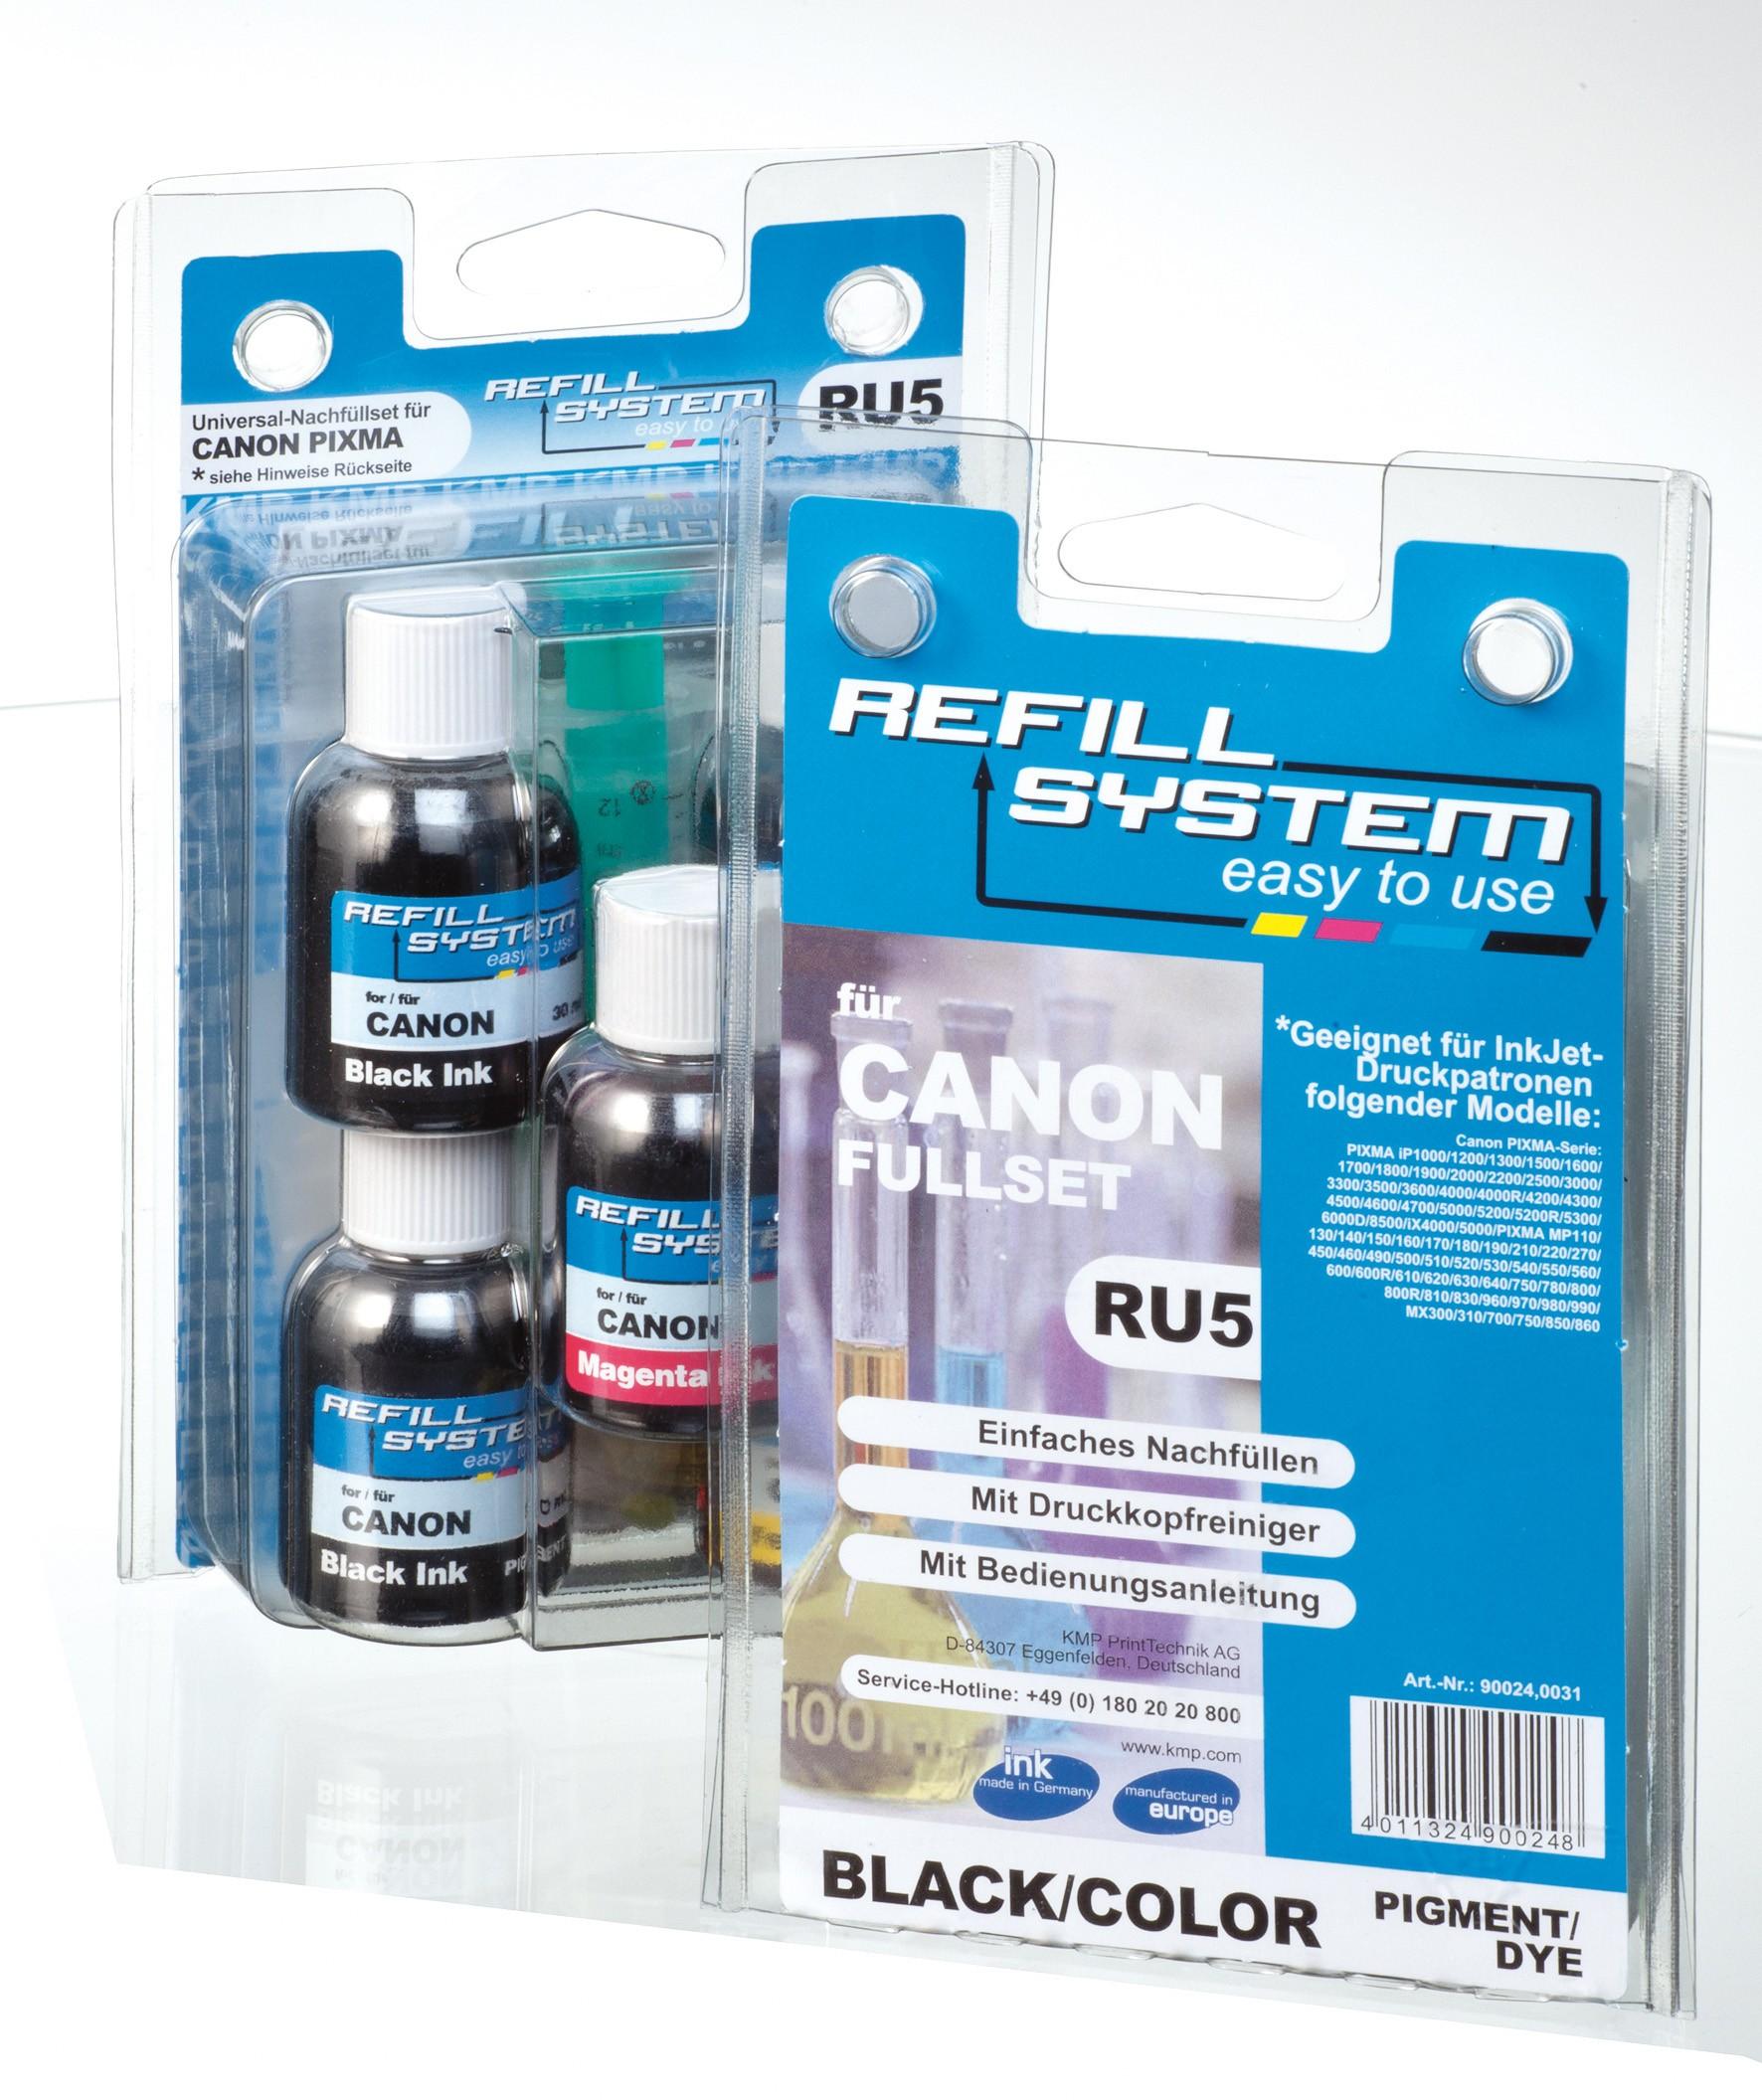 KMP Refill-System RU5 für Canon Pixma Serie Fullset